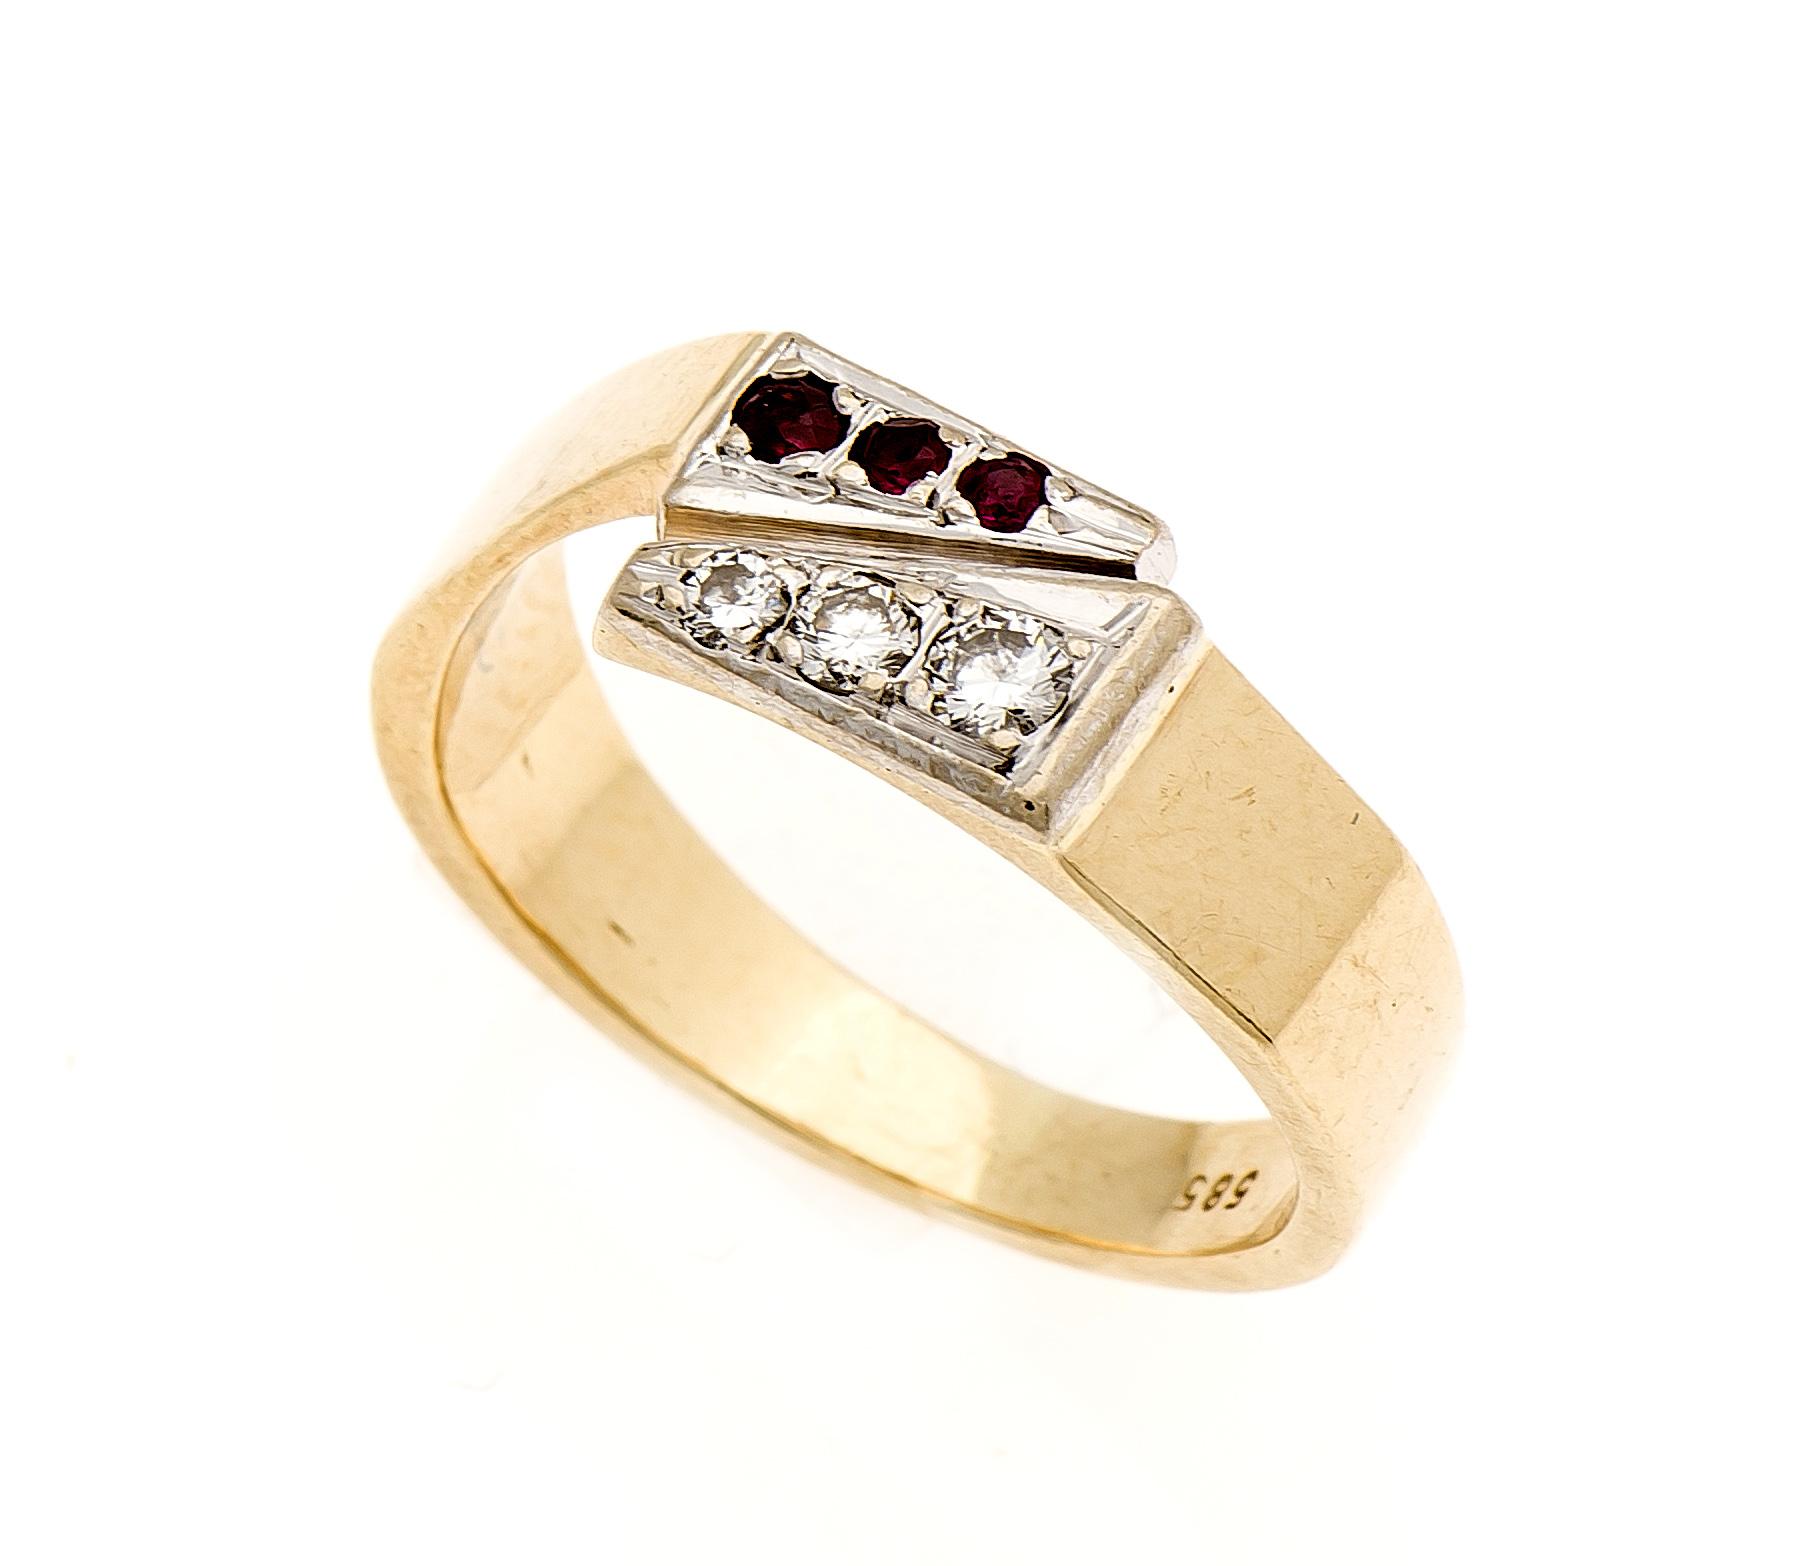 Rubin-Brilli-Ring GG/WG 585/000 mit 3 rund fac